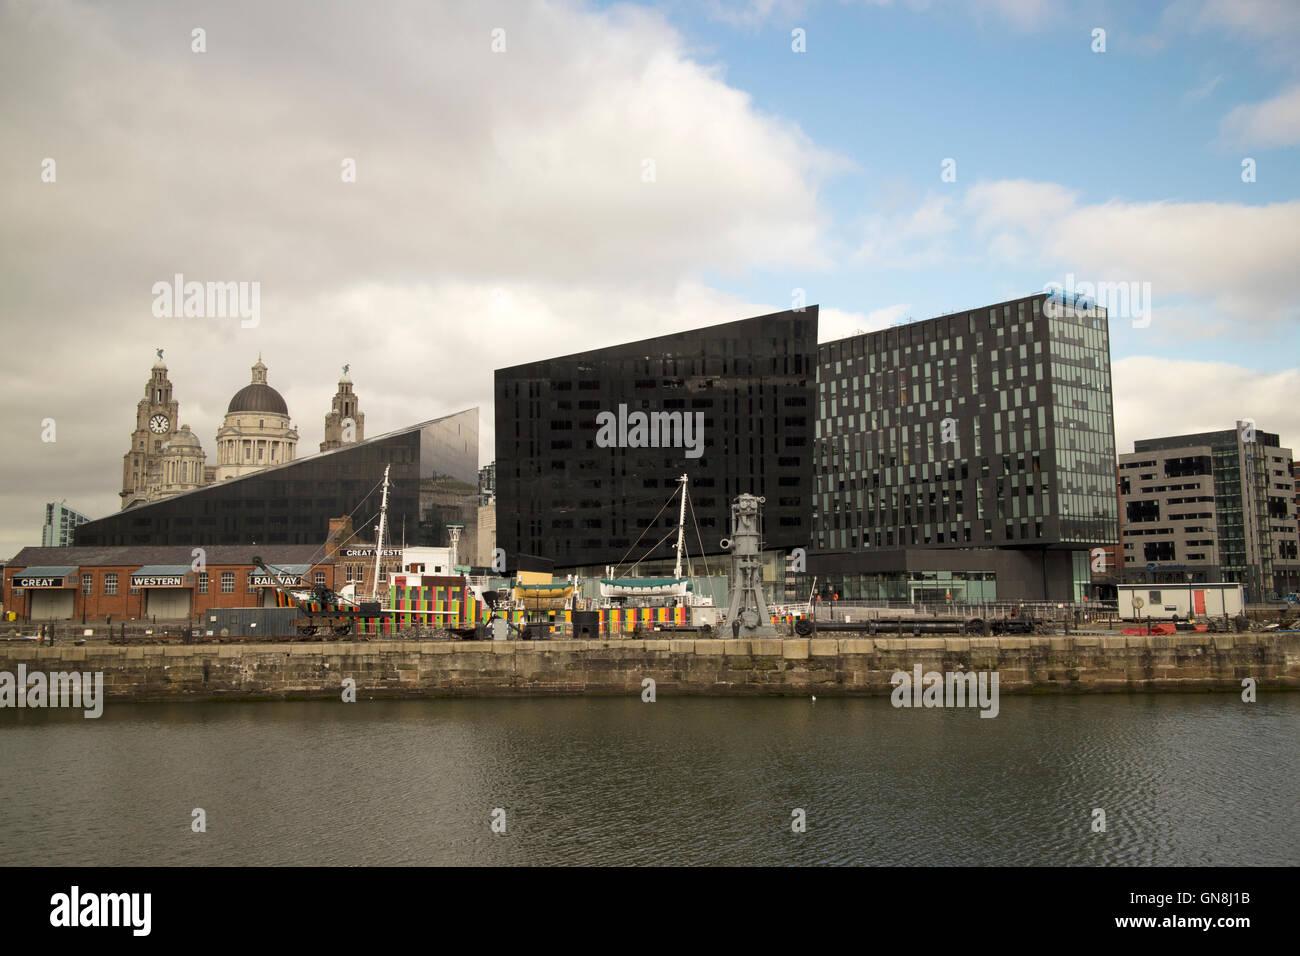 canning docks and mann island Liverpool docks Merseyside UK - Stock Image